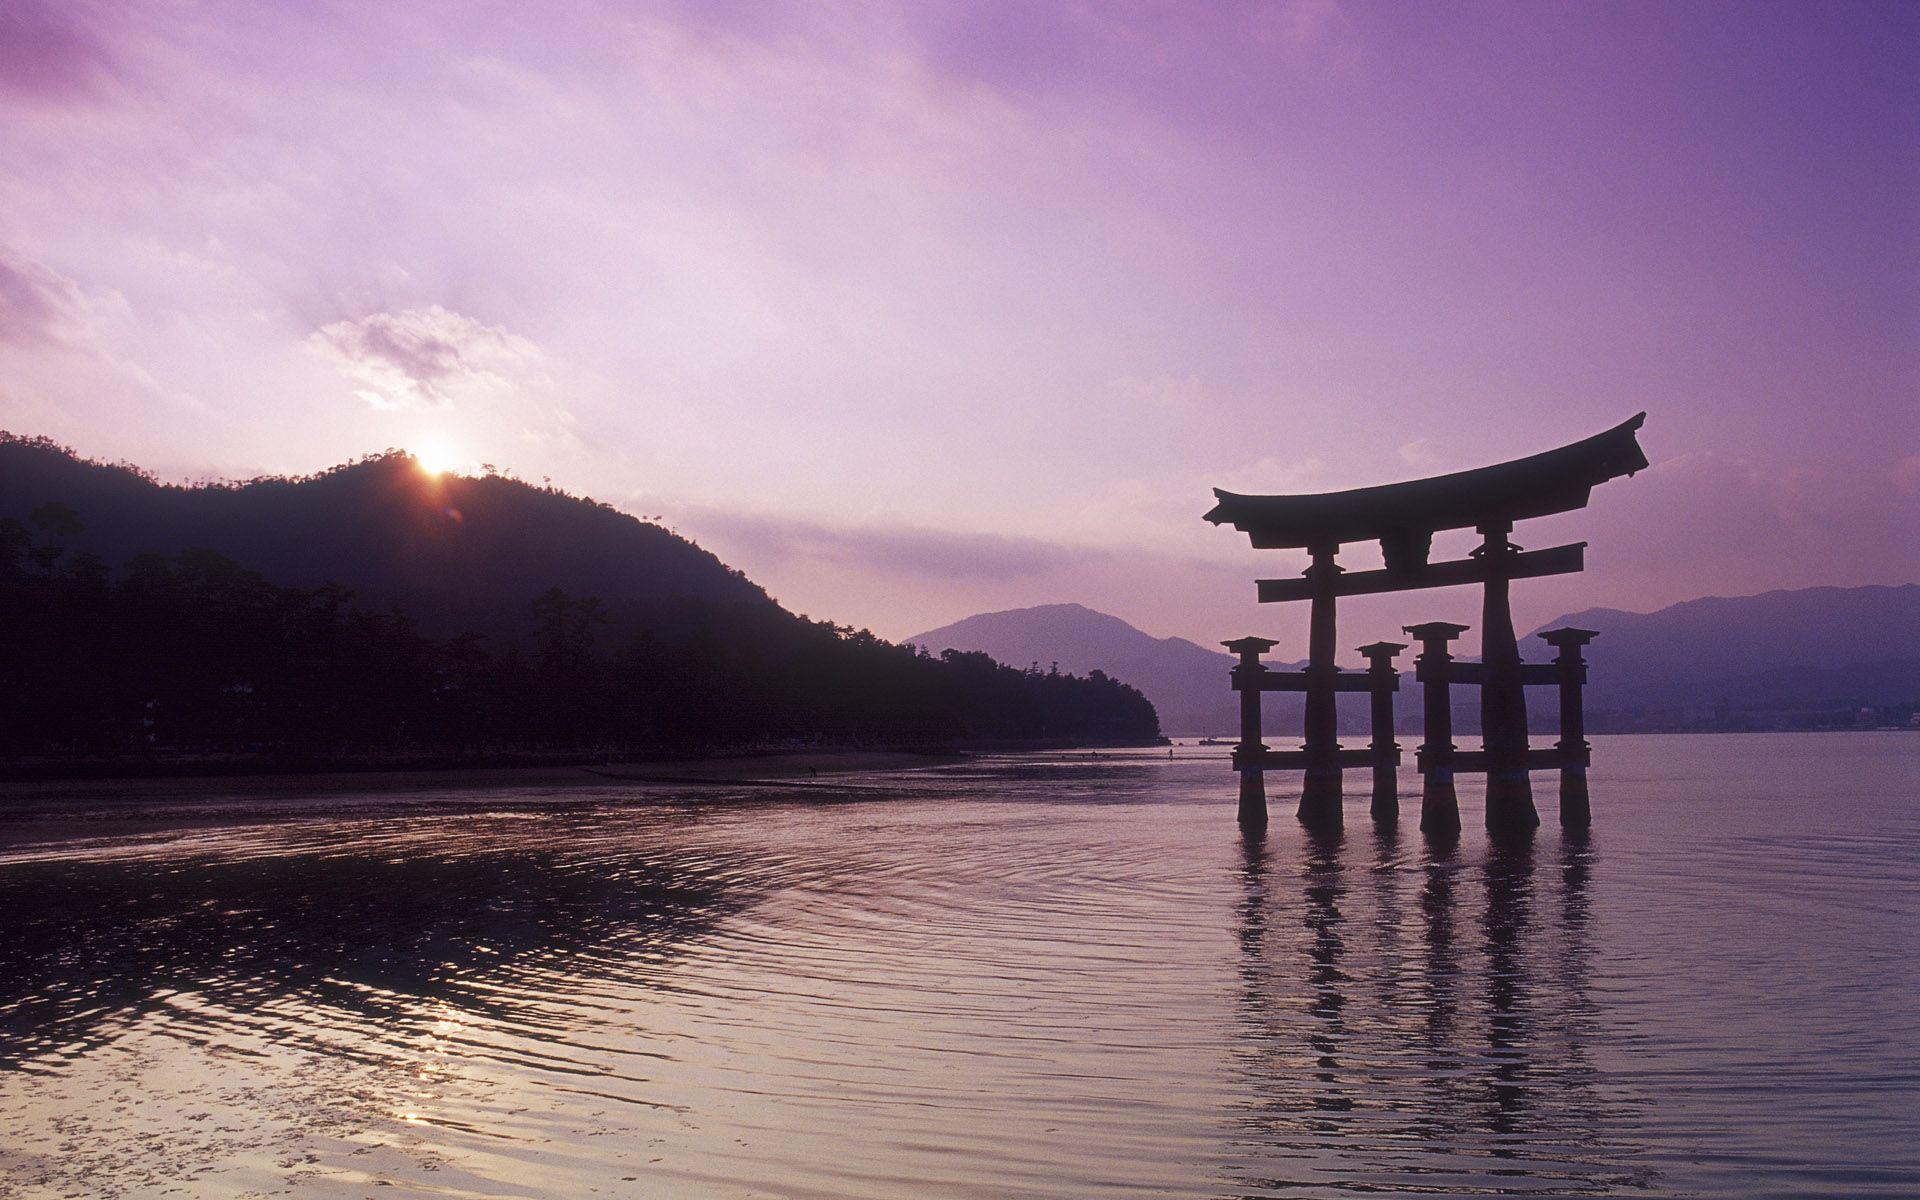 30 Amazing Windows 7 High Resolution Wallpapers Pack 1920 X 1200 Japanese Landscape Japan Landscape Scenery Wallpaper